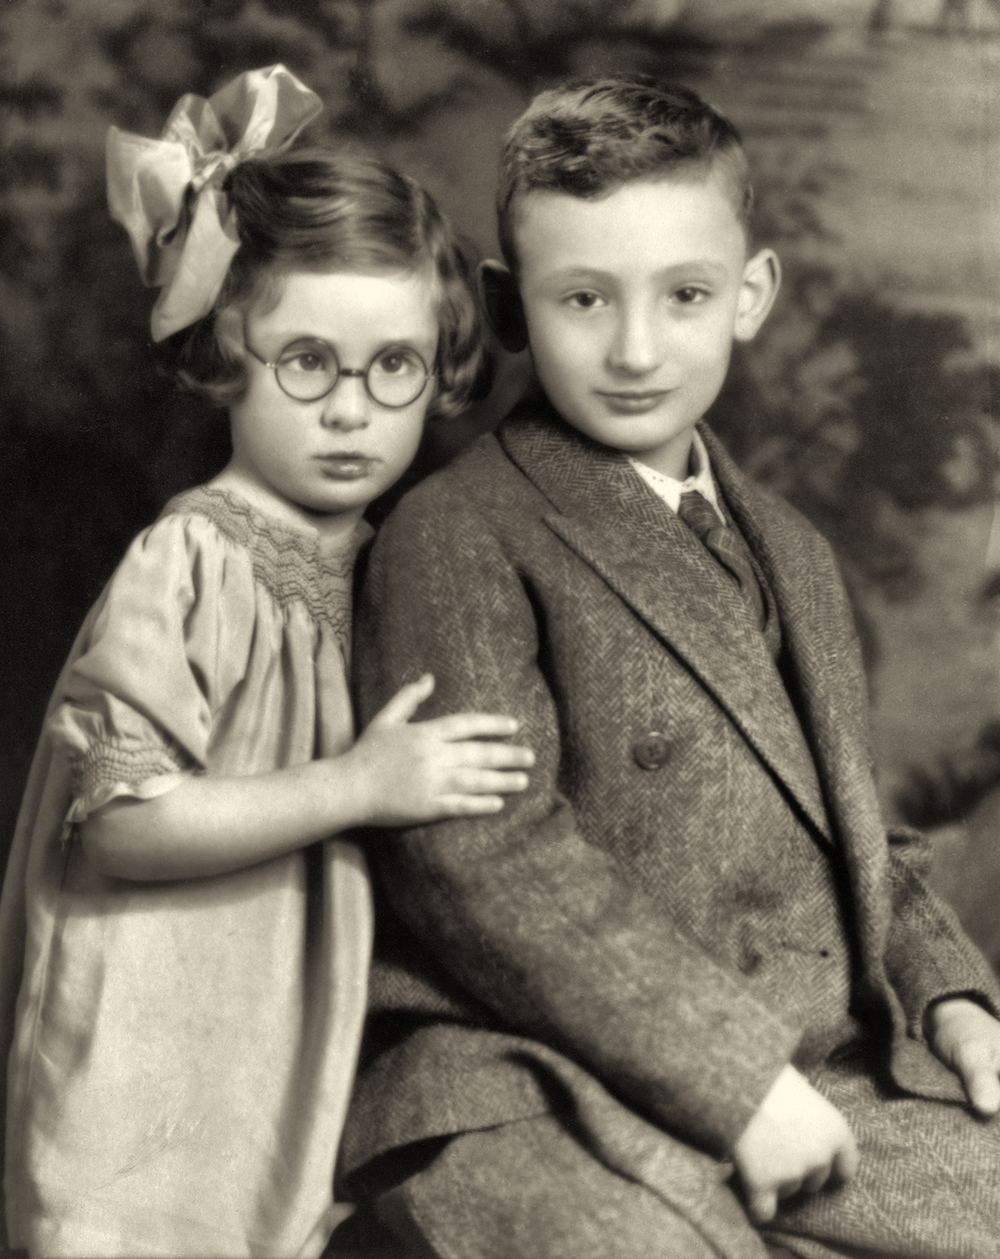 Lillian and Bernard Finestone